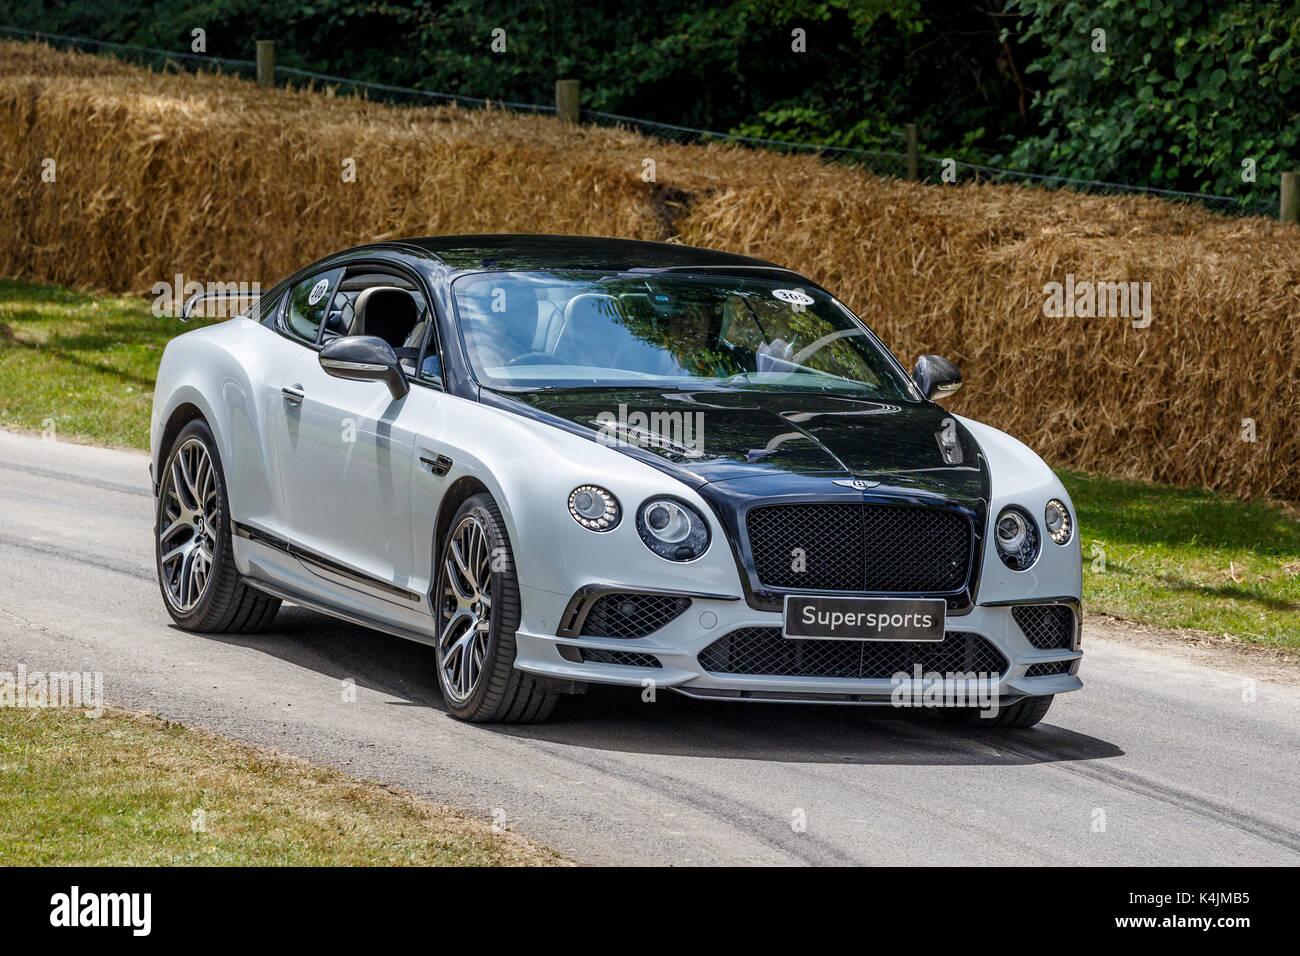 Bentley Continental Gt Speed Fotos E Imagenes De Stock Alamy